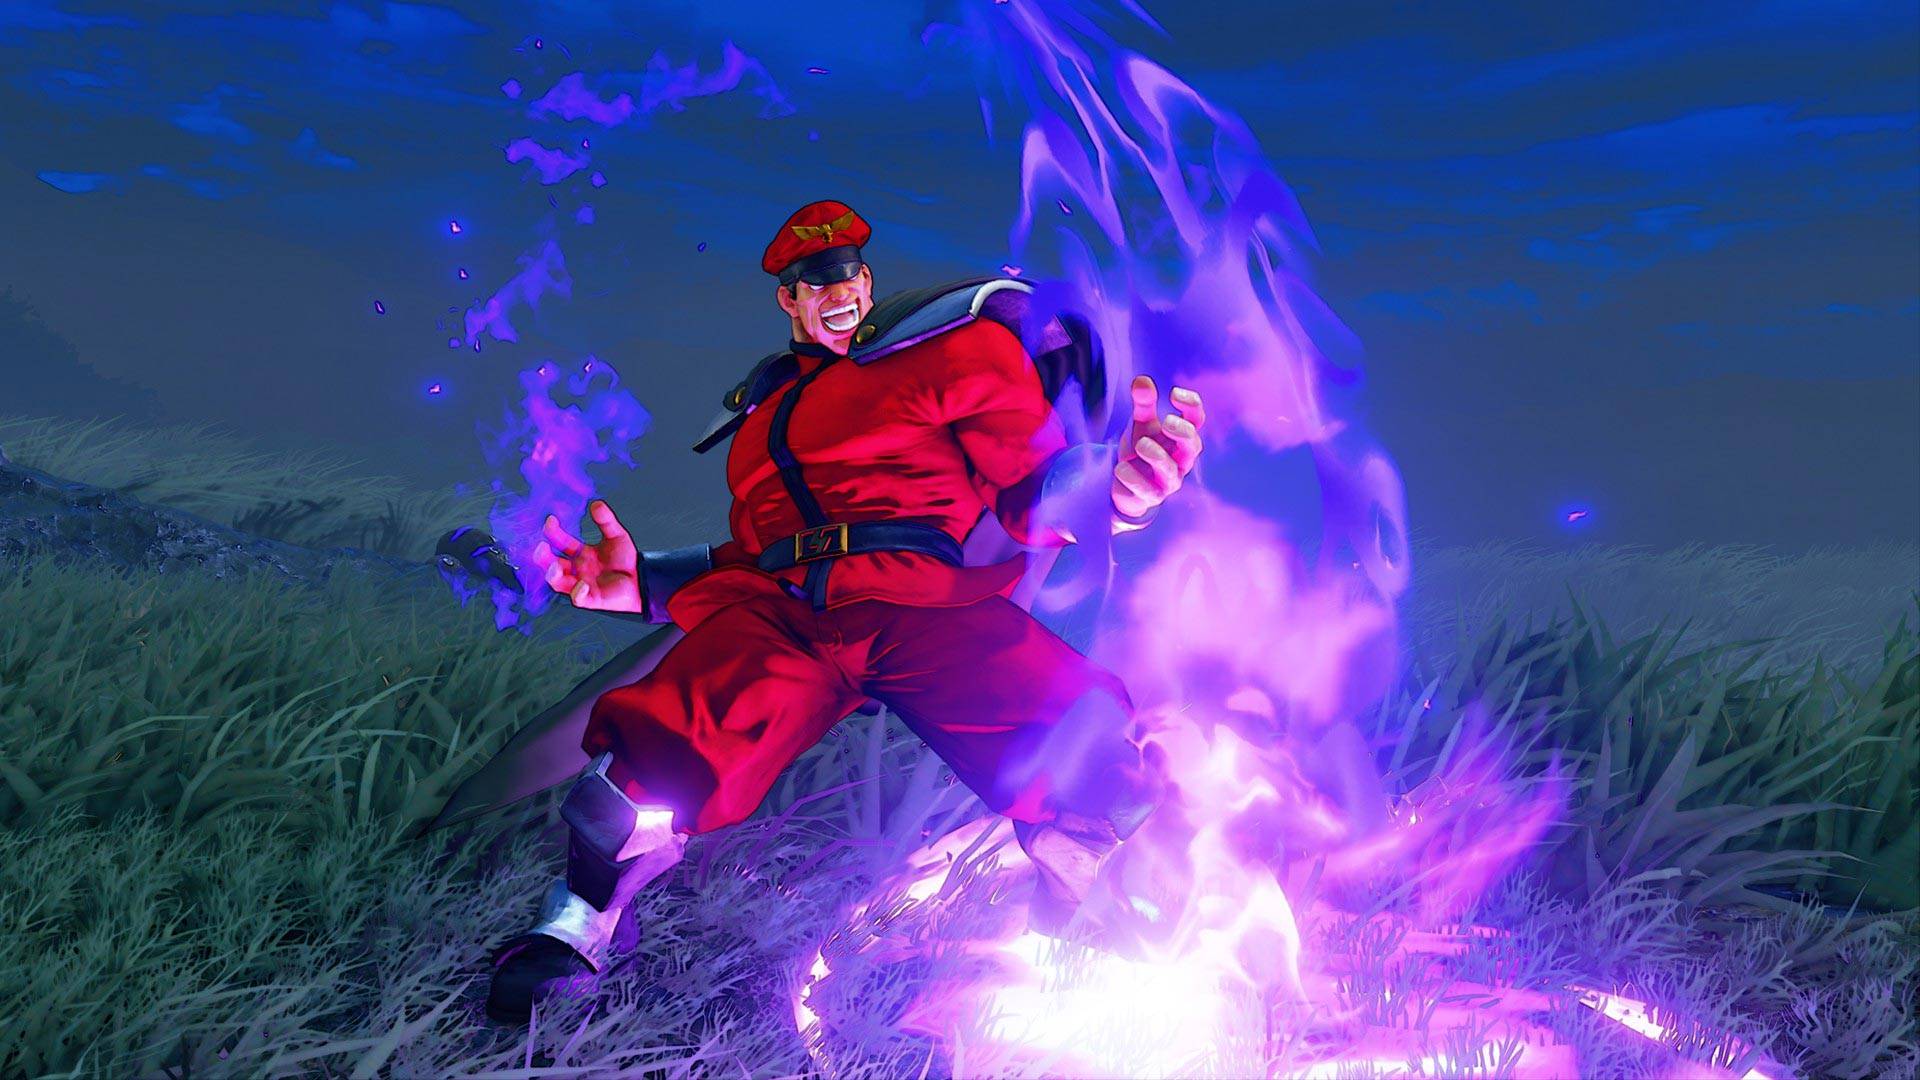 Street Fighter 5 Summer bundle DLC screenshots 8 out of 8 image gallery